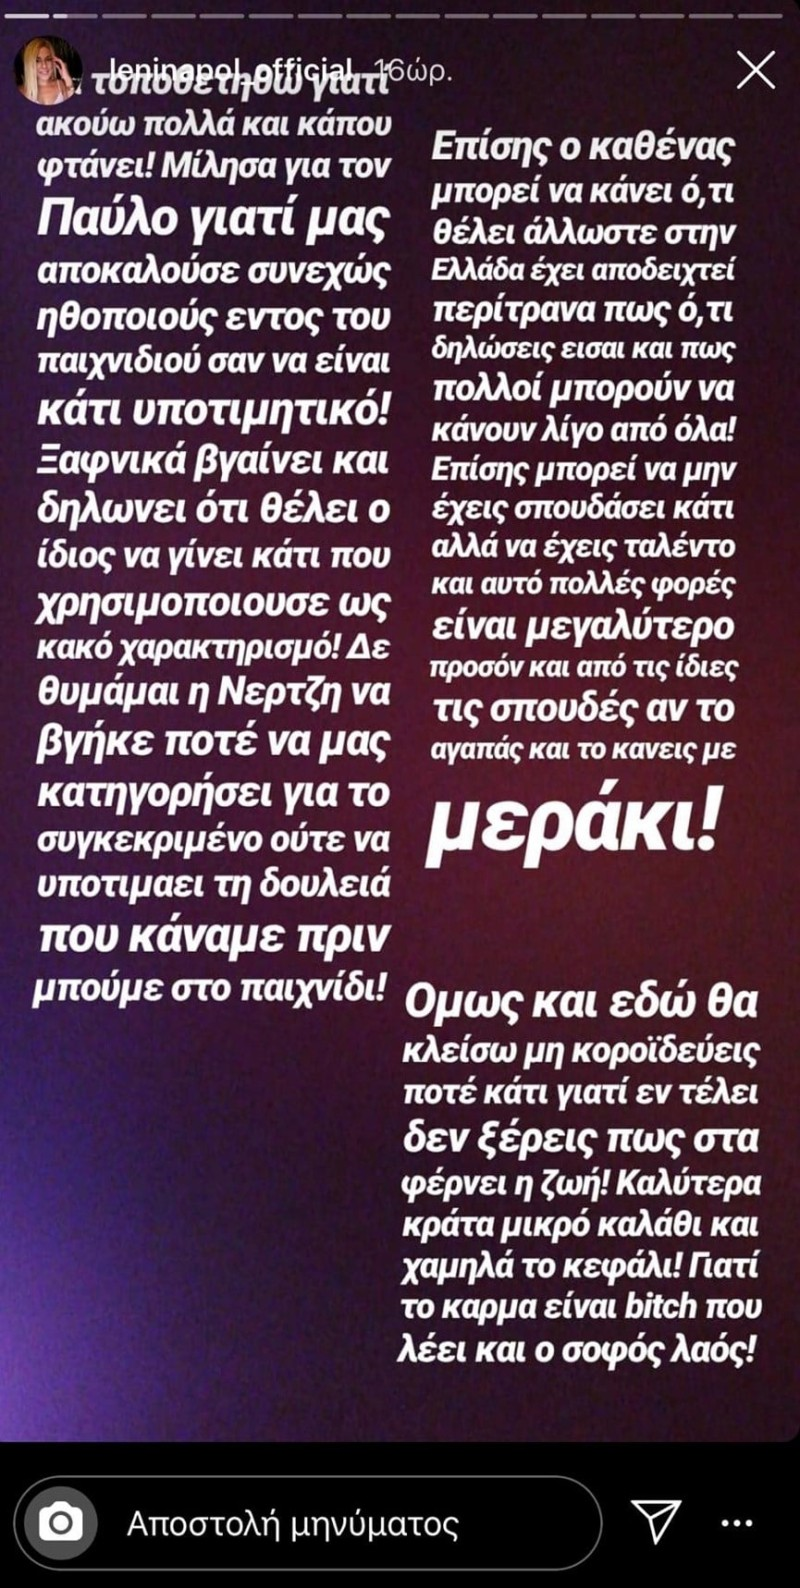 Power of Love: Η Έλενα Πολυχρονοπούλου «ρίχνει πυρά» δημόσια κατά του Παύλου Παπαδόπουλου!